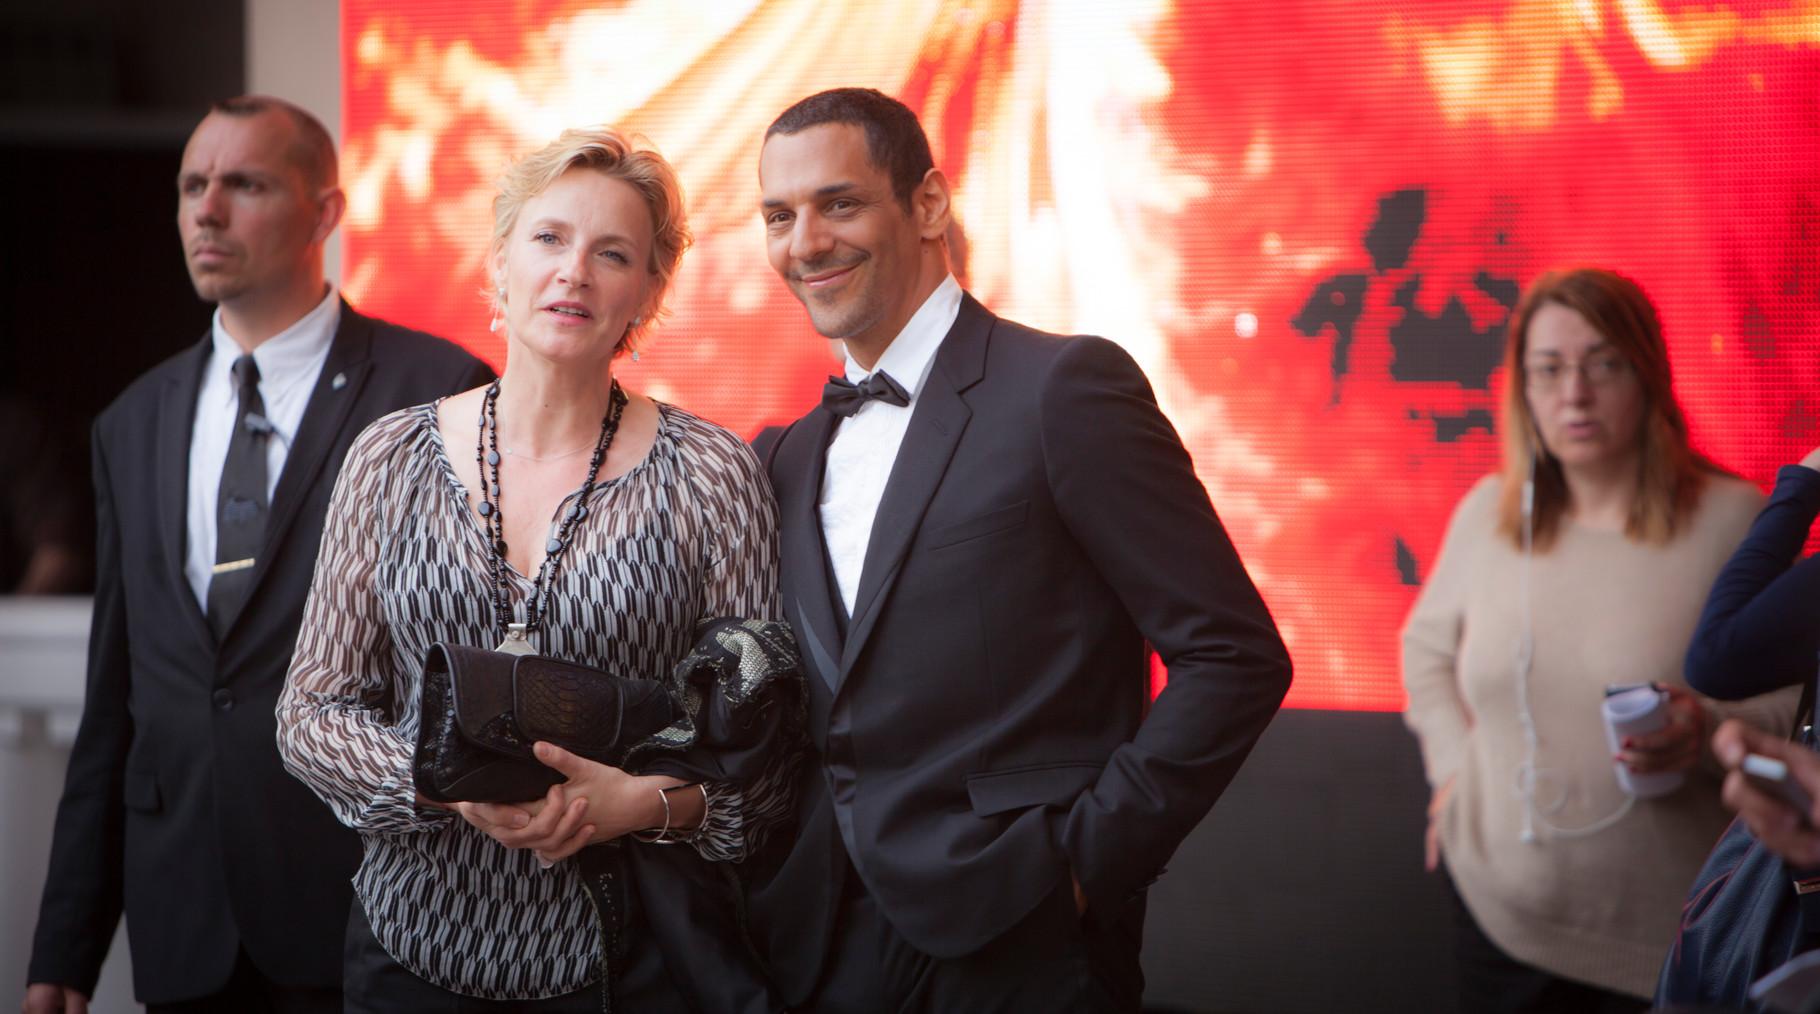 Tomer Sisley - Festival de Cannes 2015